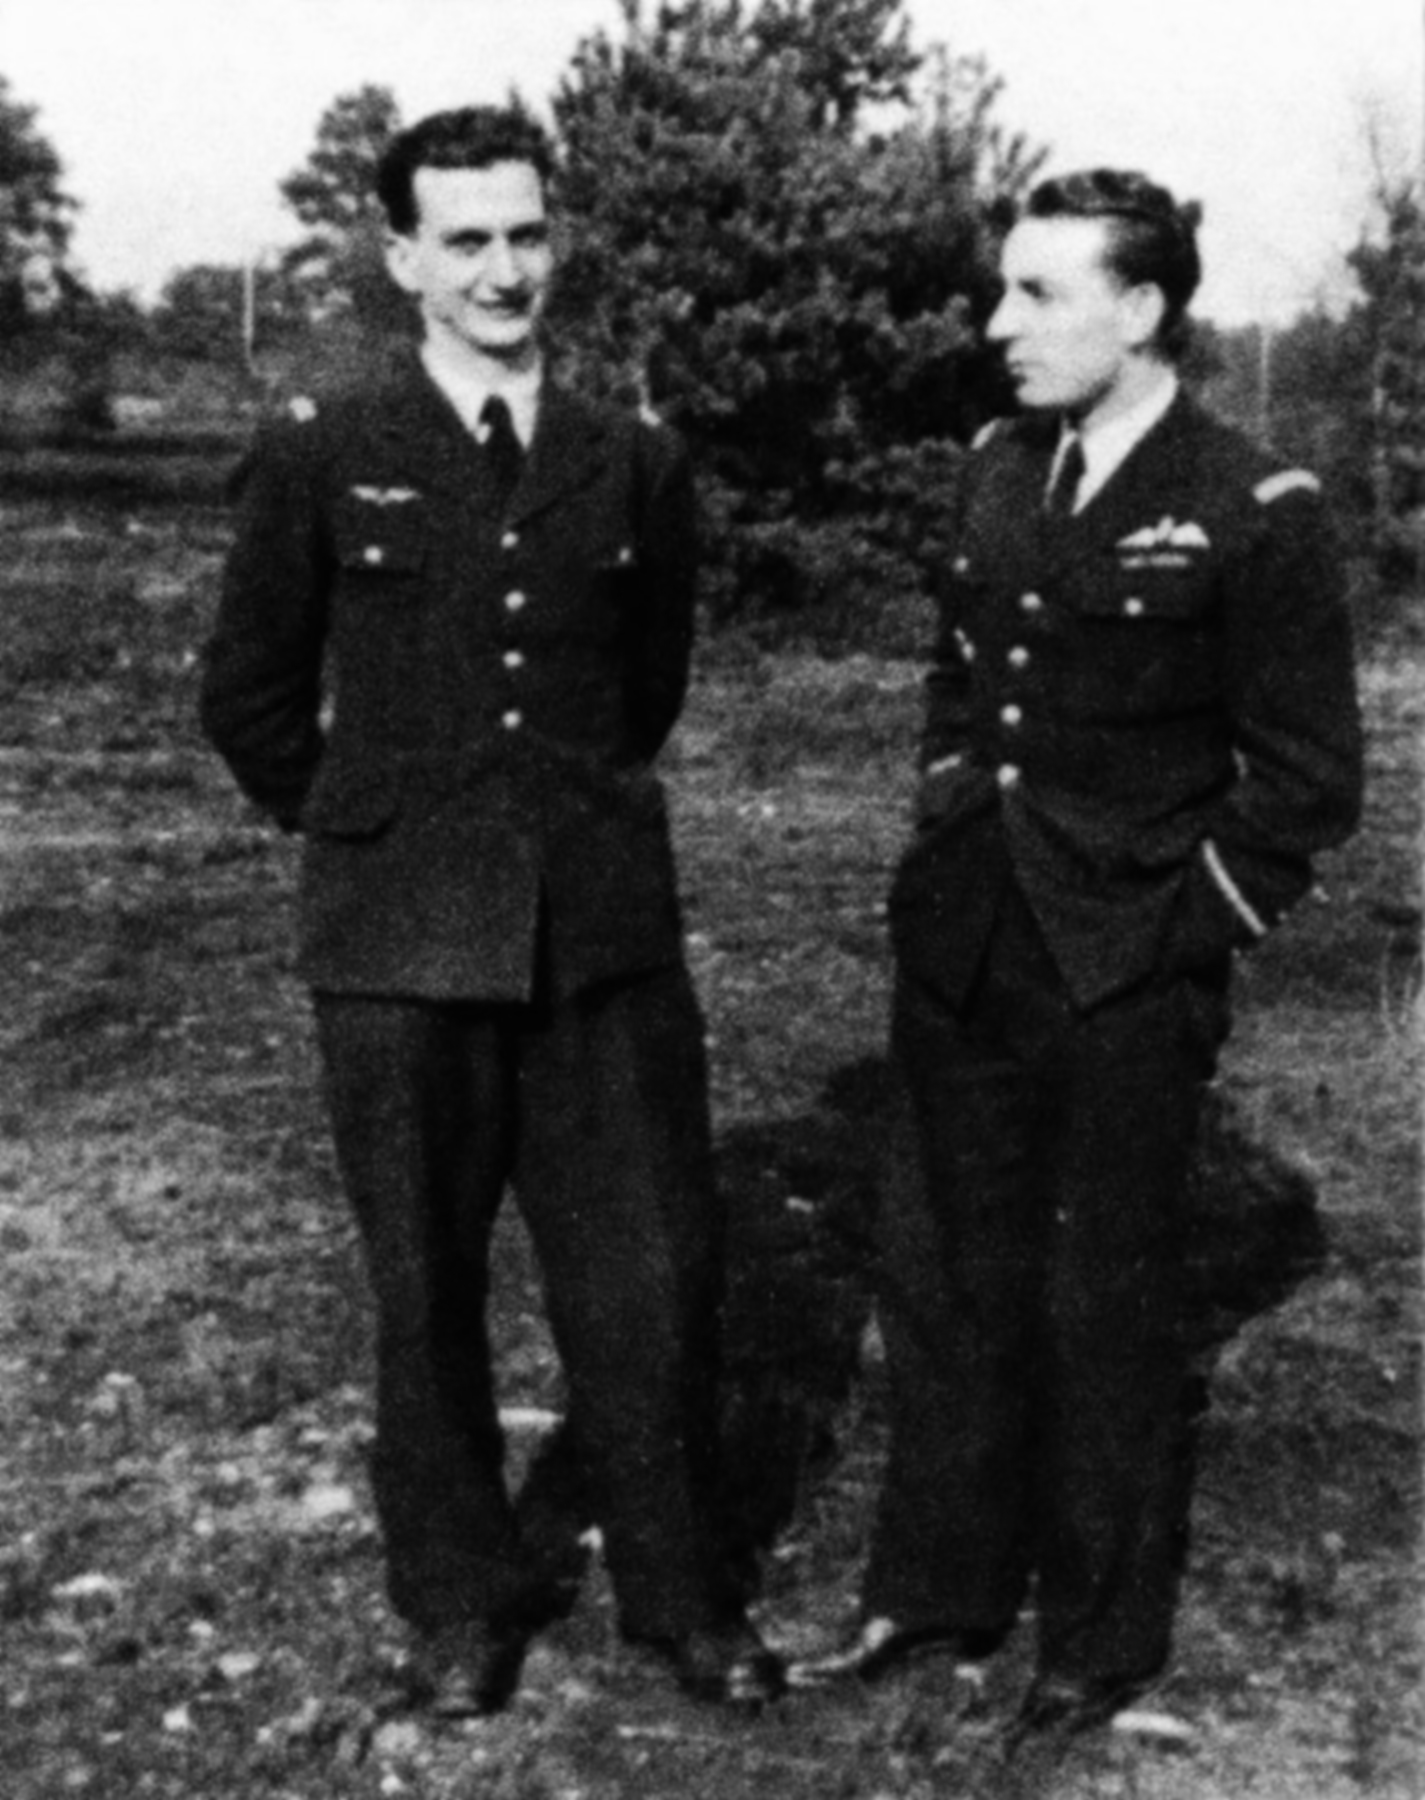 Aircrew RAF 341Sqn and 340Sqn Rene Molinari and Pierre Borudy Sep 1944 01